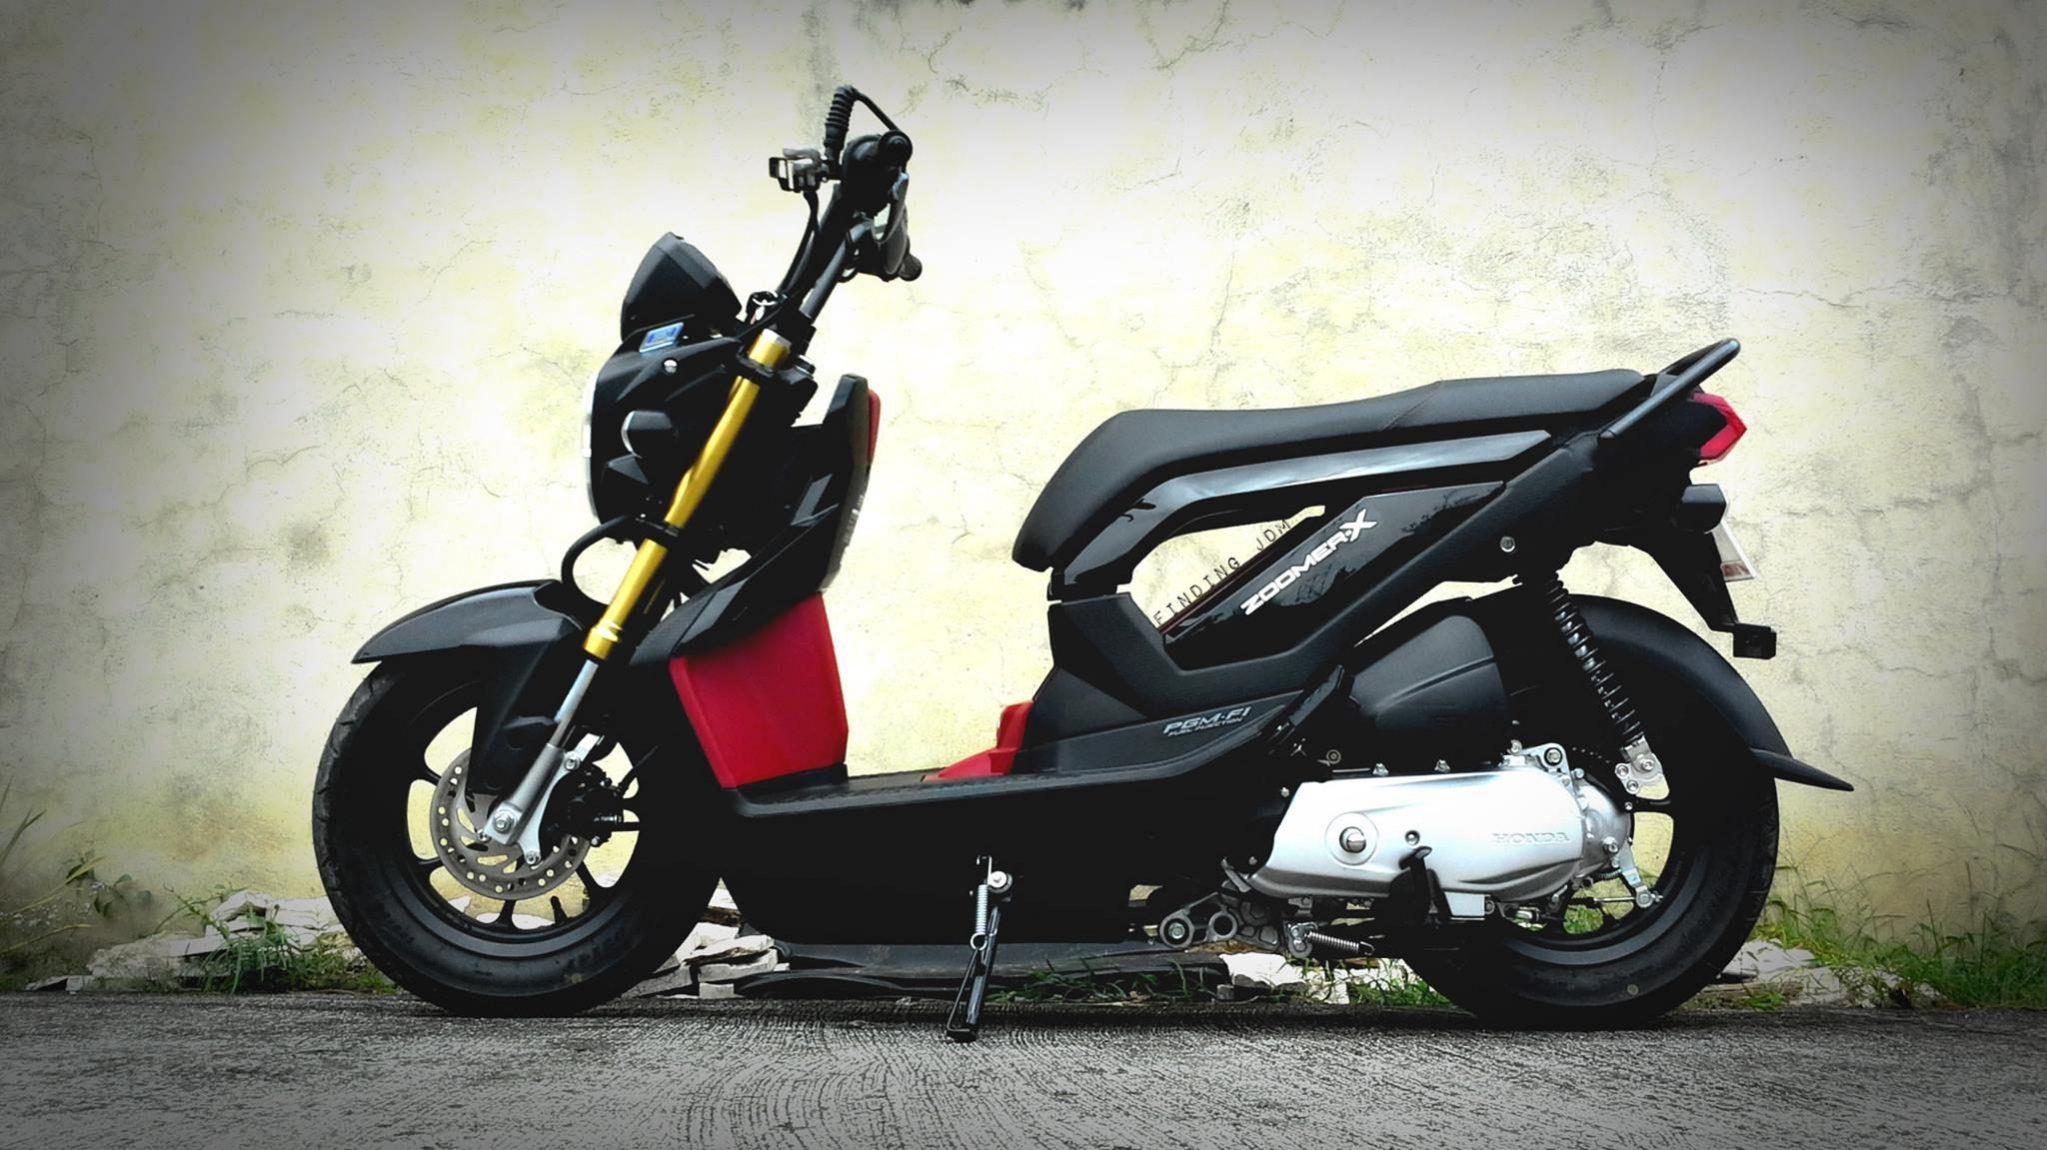 Motorcycle Rental Chiang Mai, Thailand.